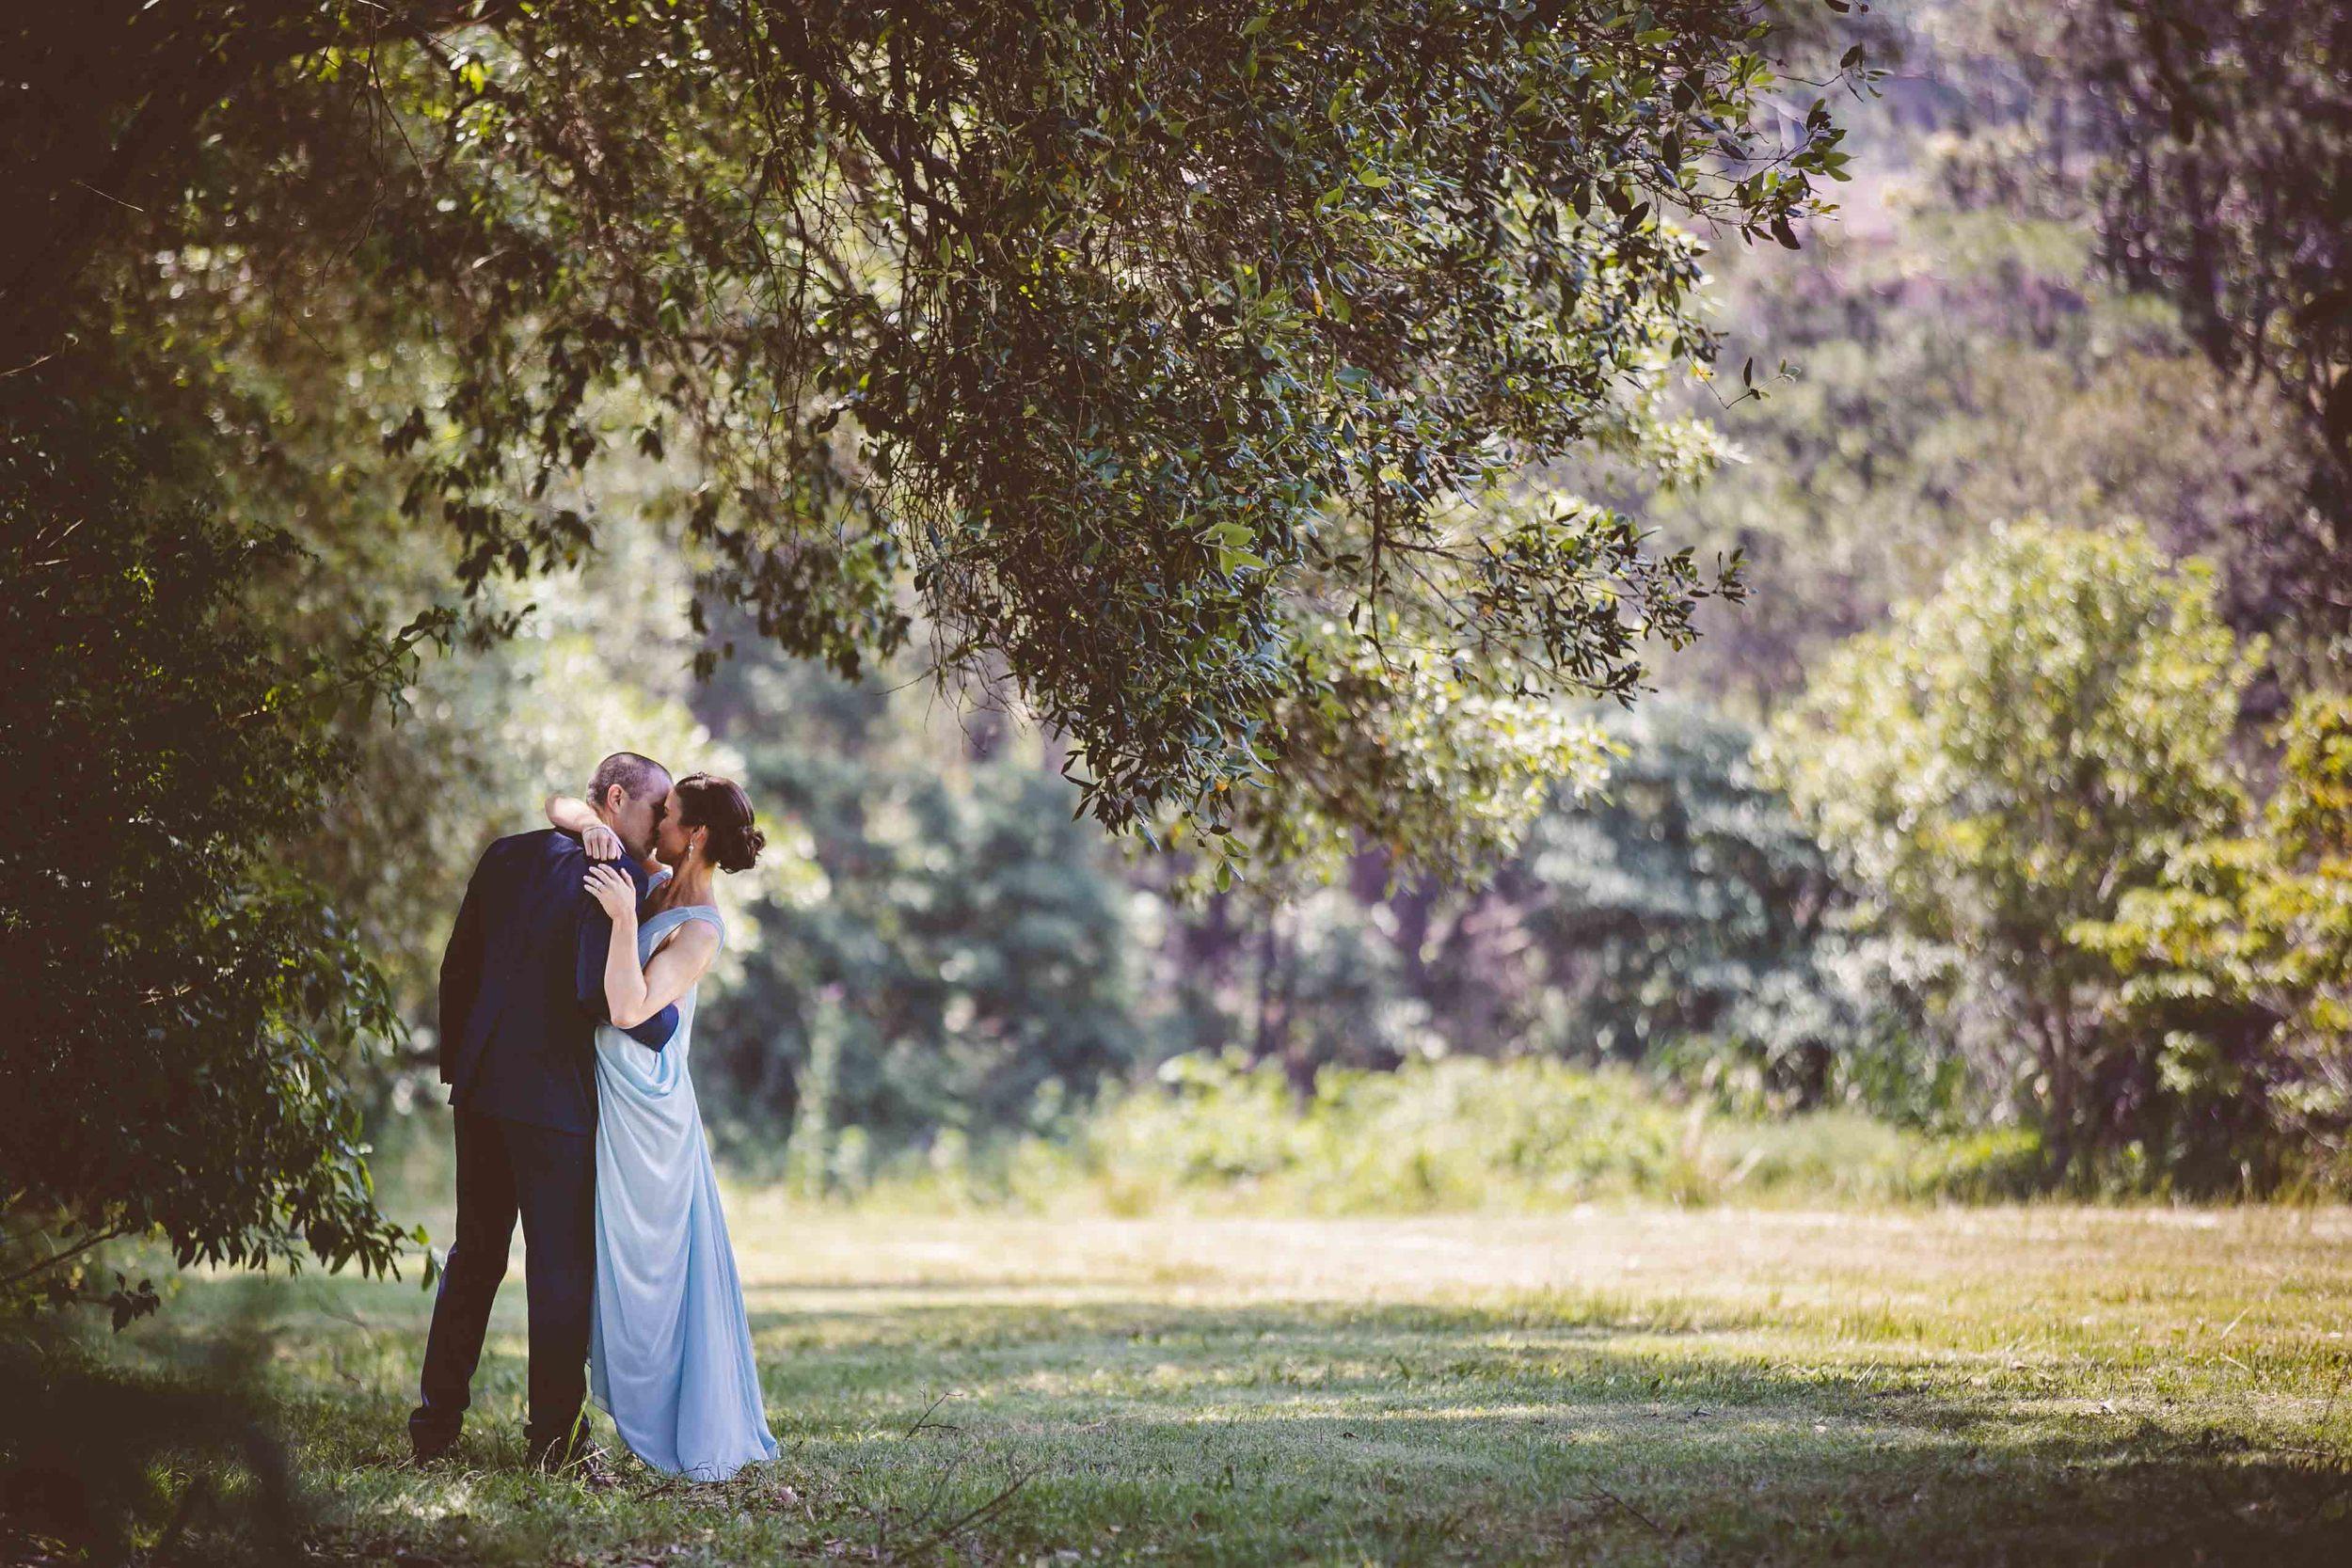 Angela and Steve wedding Bells at Killcare by Milton Gan.jpg